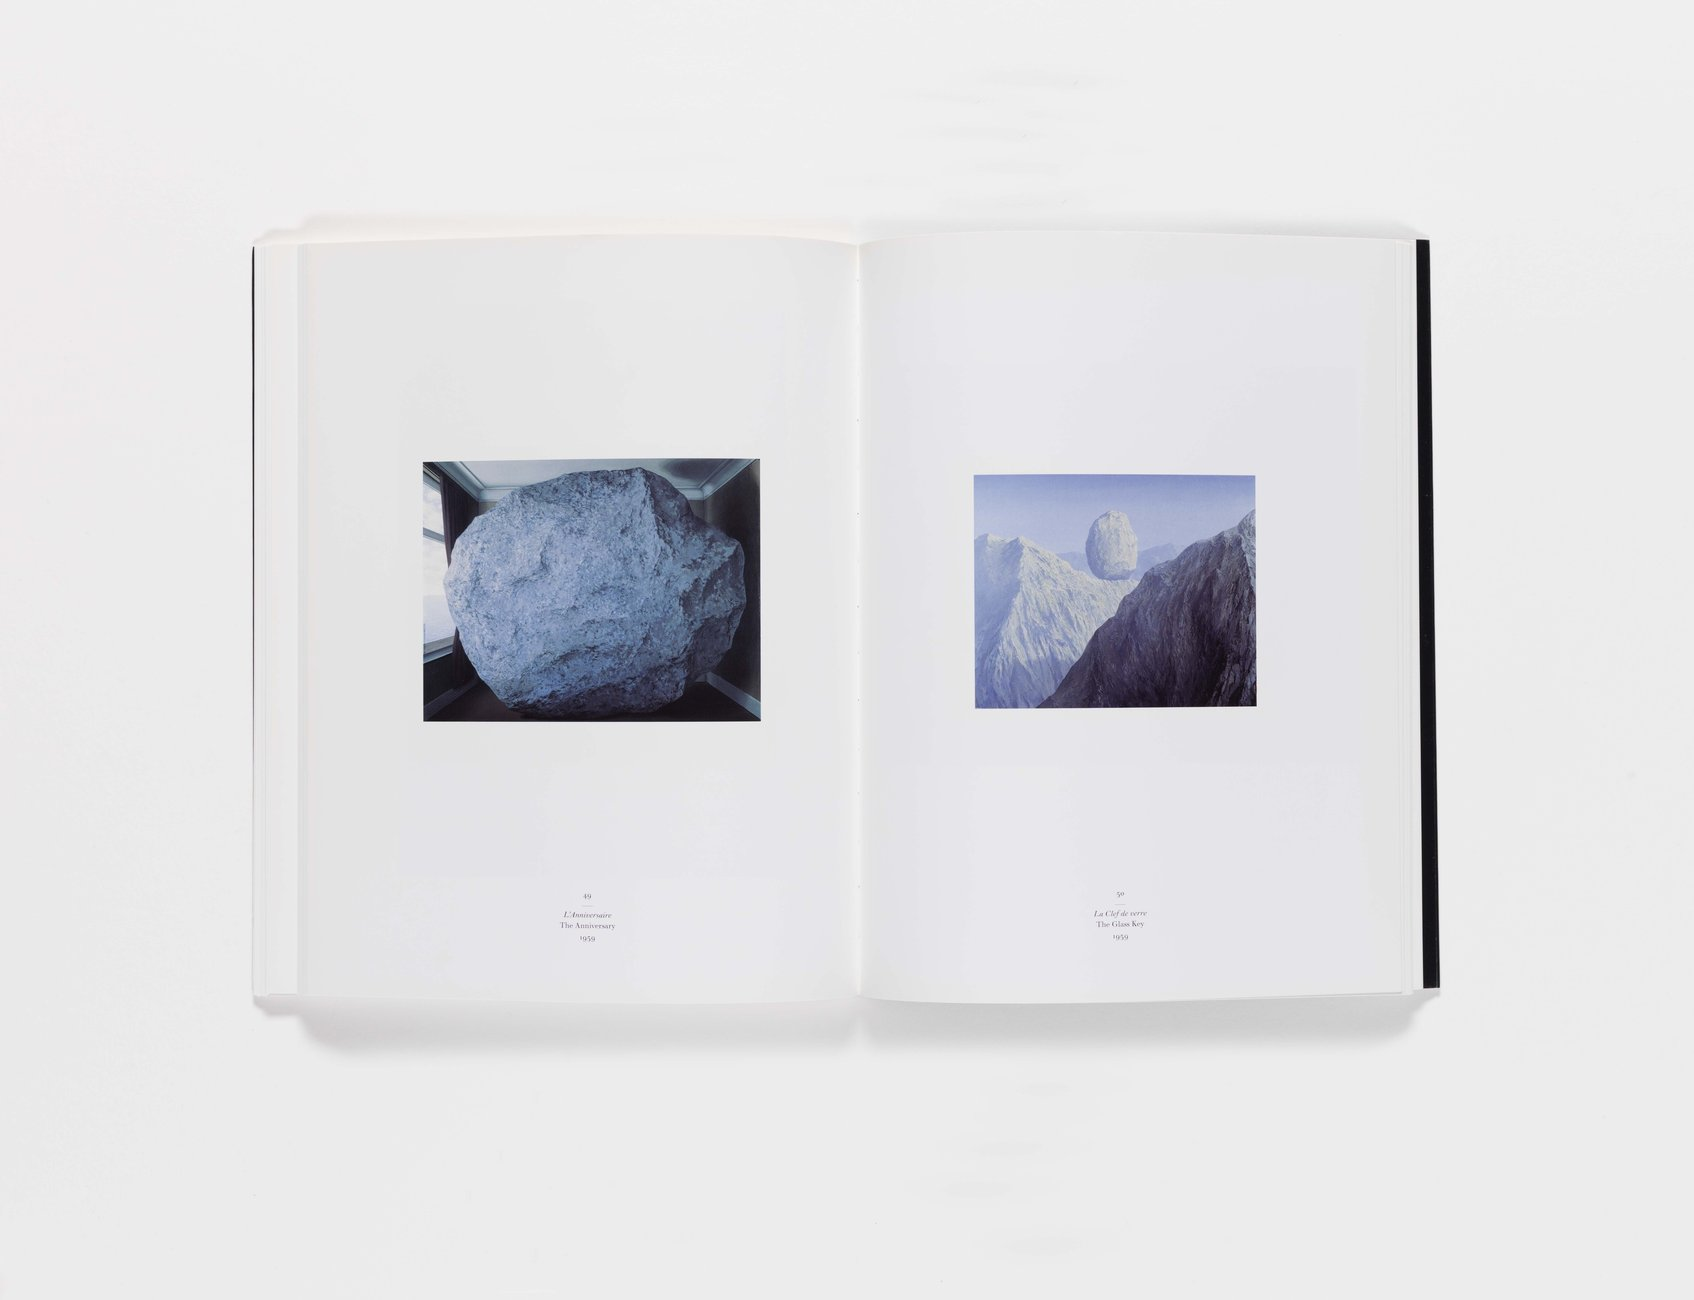 Magritte publication pages 80-81